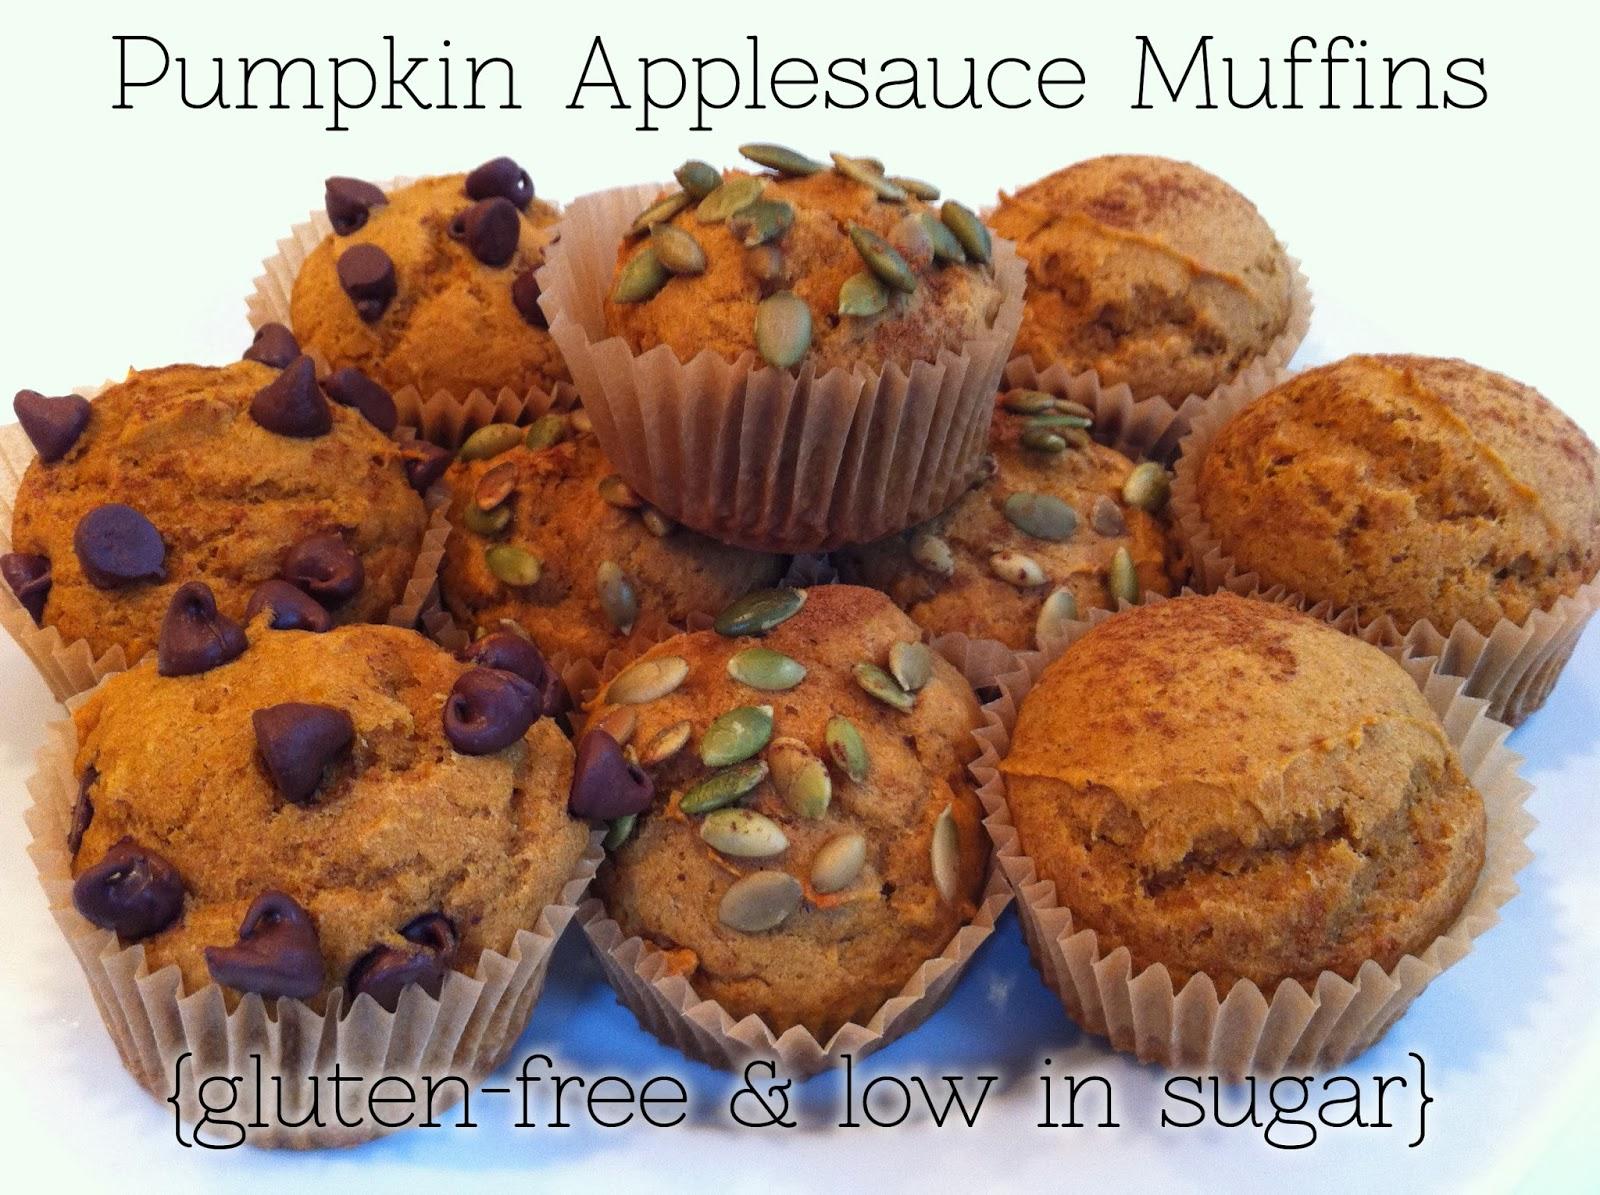 eco ike: pumpkin applesauce muffins